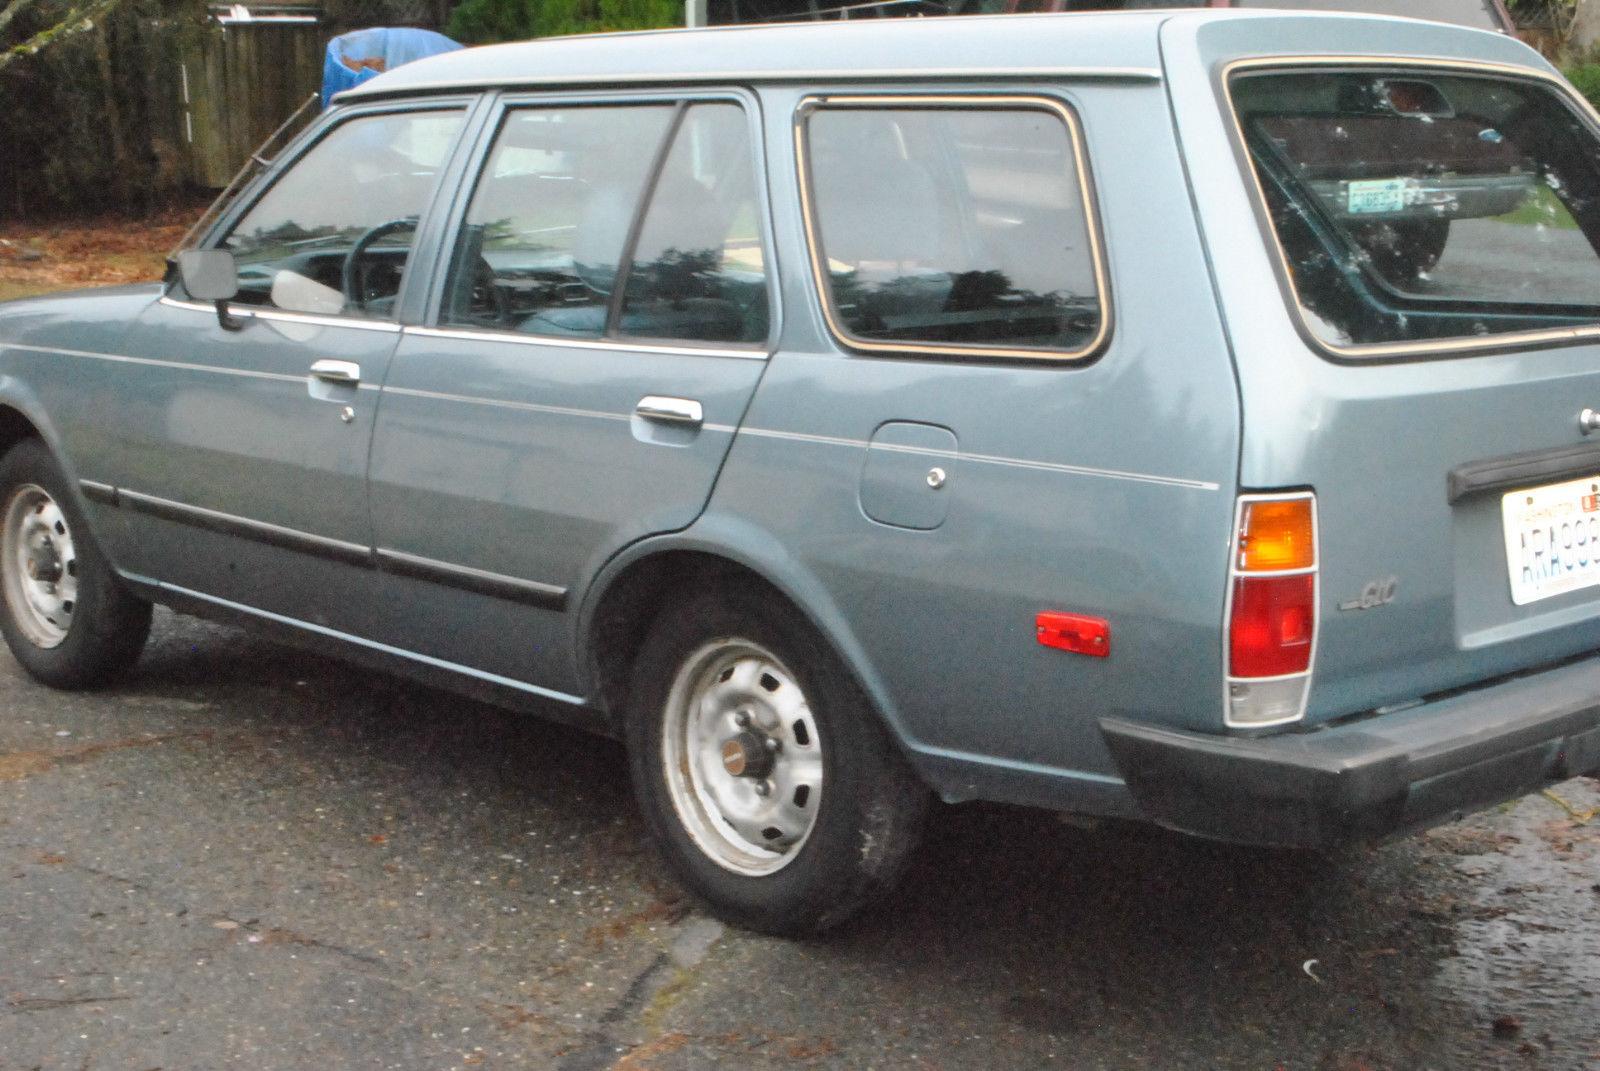 1986 Mazda Glc Wagon 1 5 Liter 5 Speed